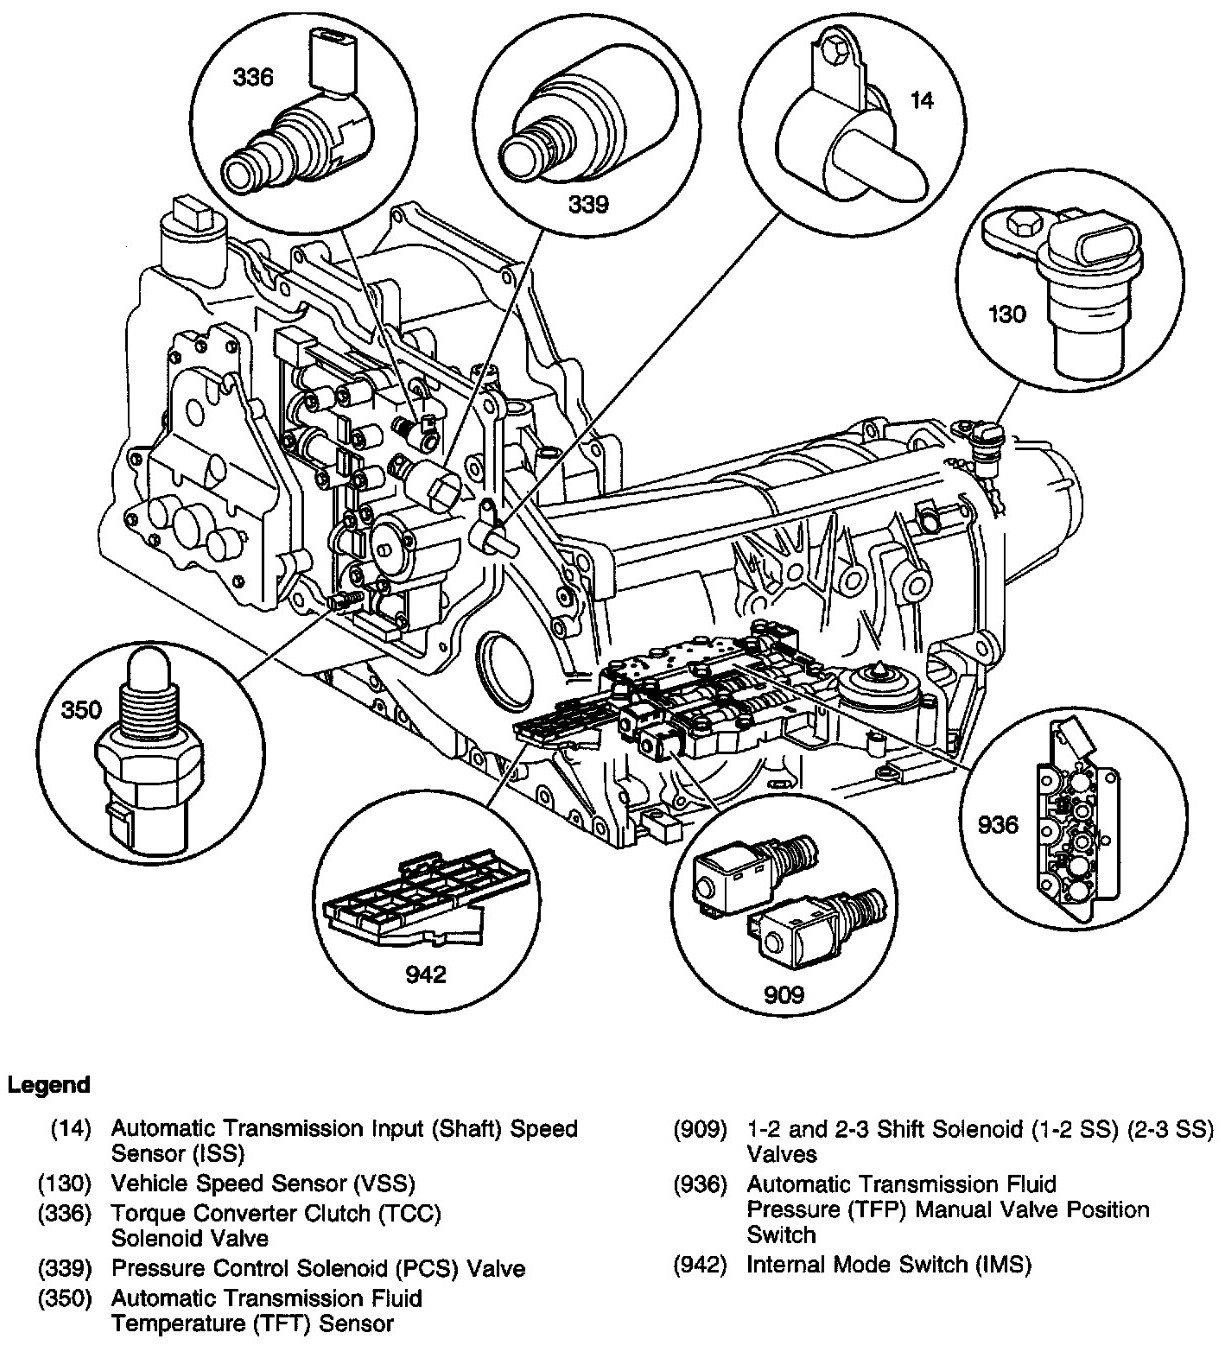 2002 Cadillac Deville Problems Codes Com